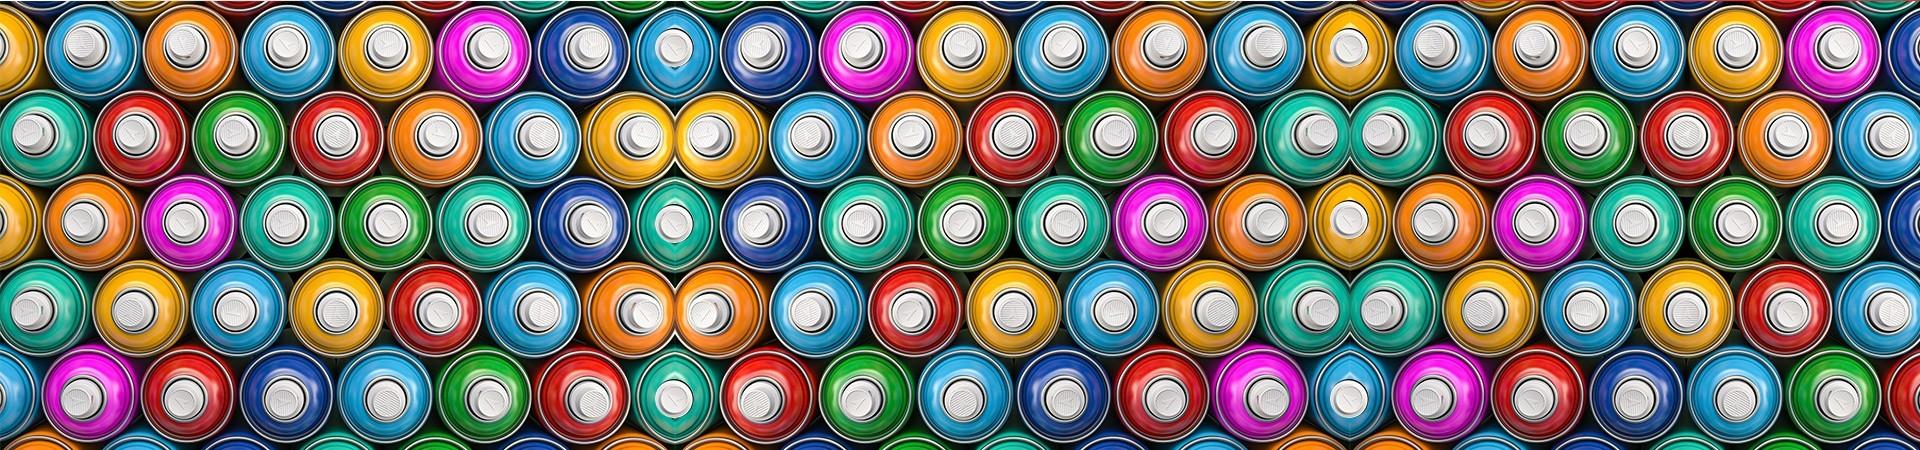 Buy Graffiti spray paints online | Banna Aerosol